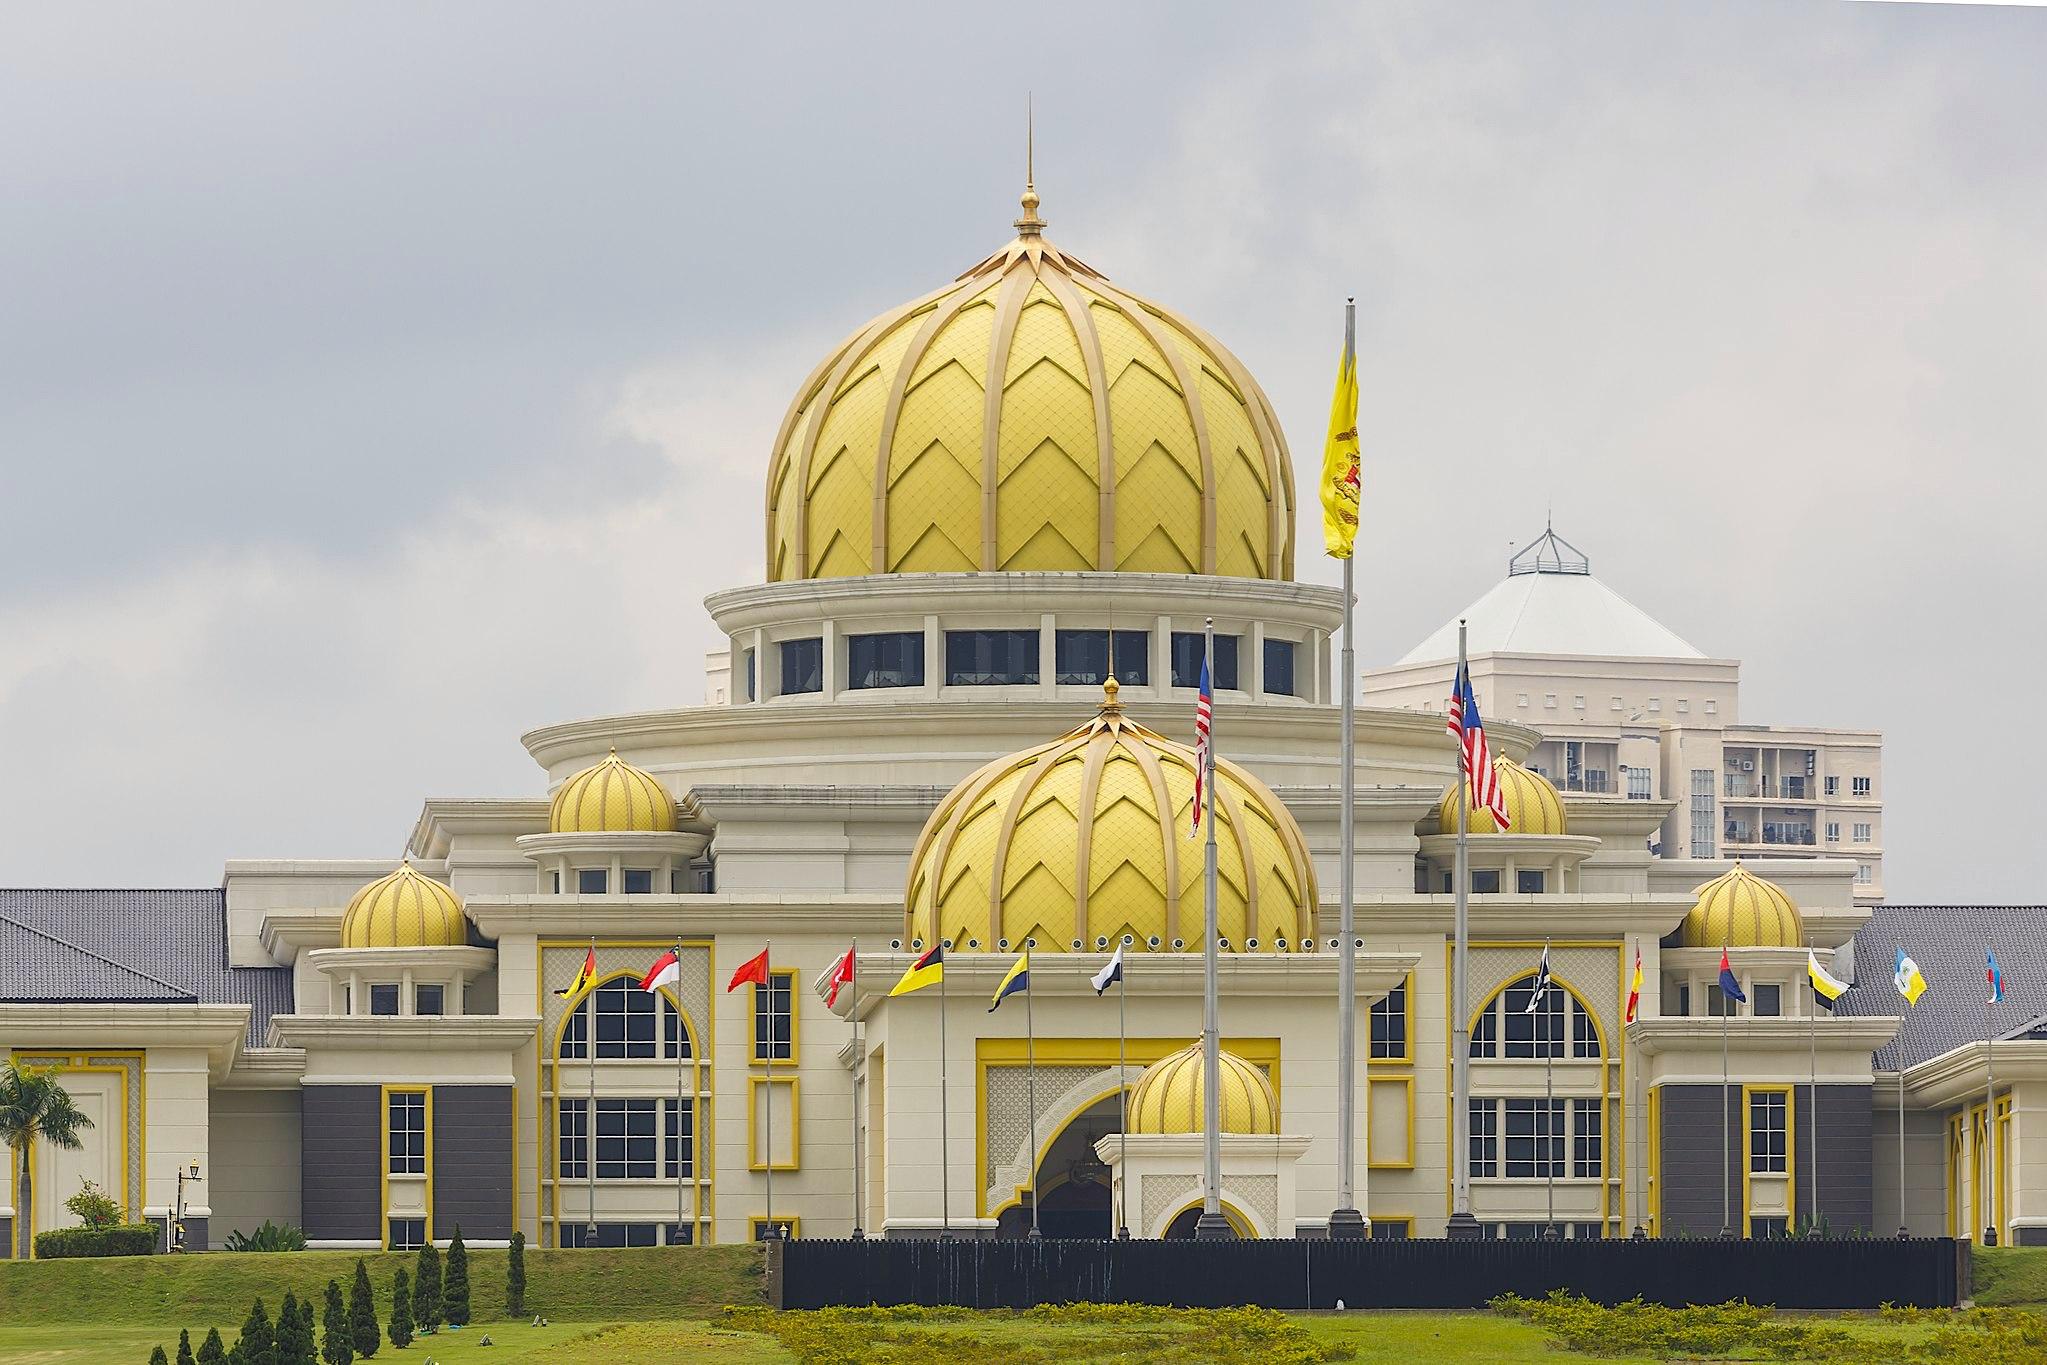 Exterior of the Istana Negara in Kuala Lumpur